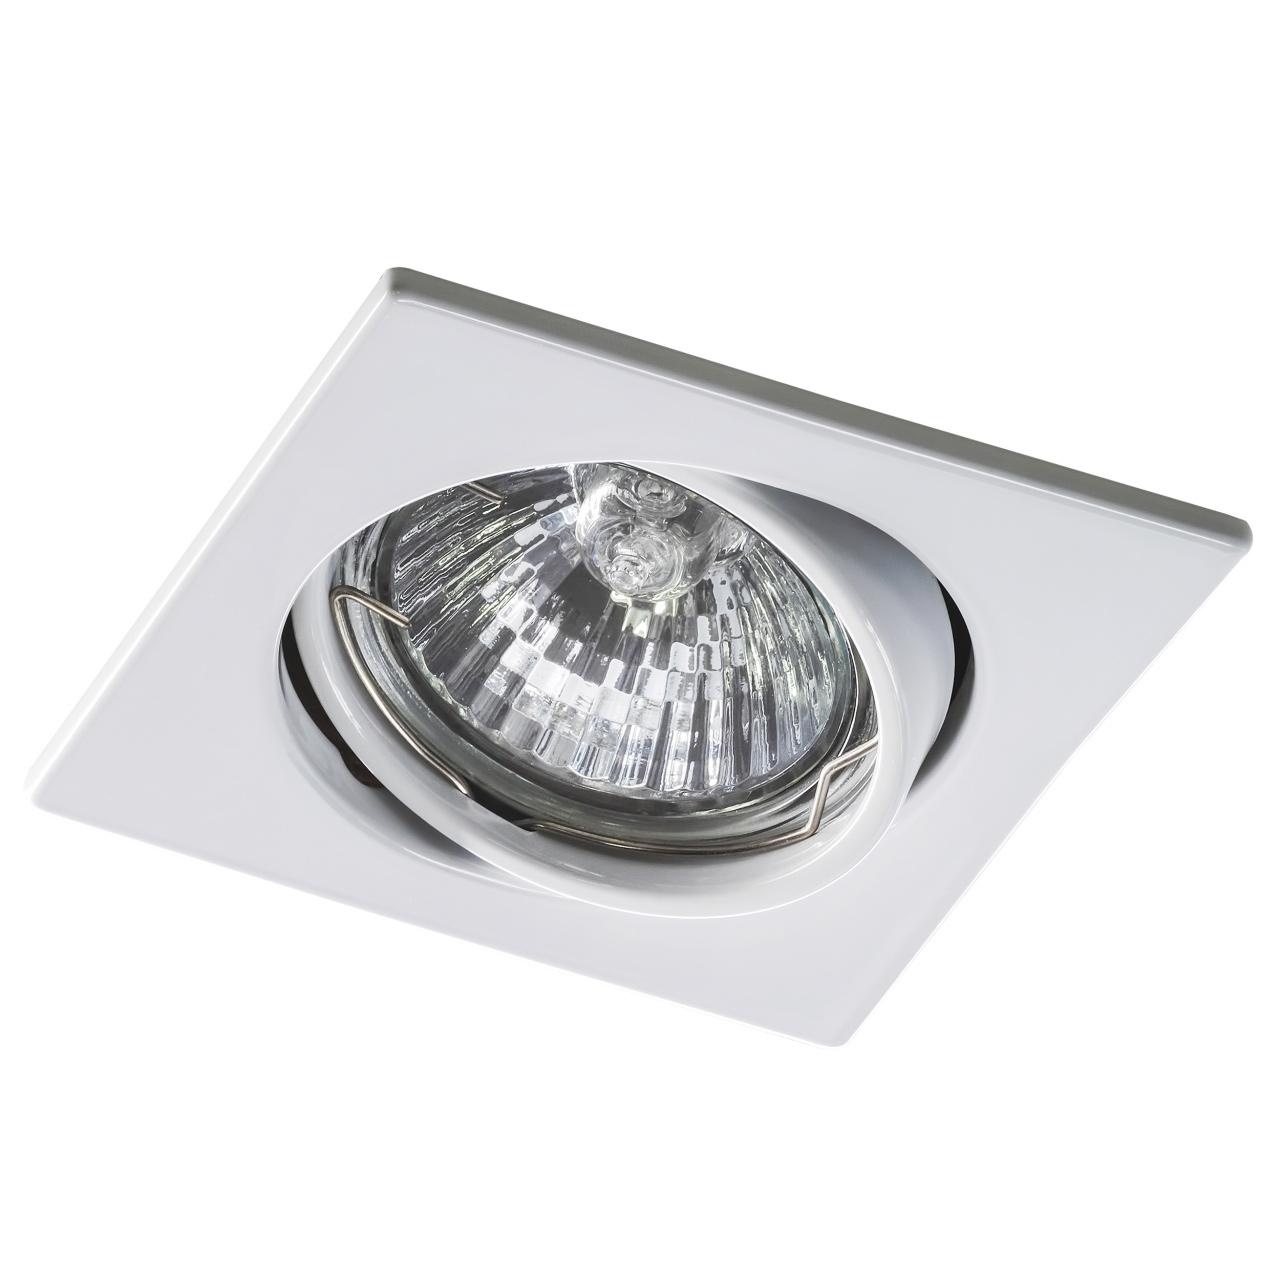 Светильник lega16 qua MR16 / HP16 белый Lightstar 011940